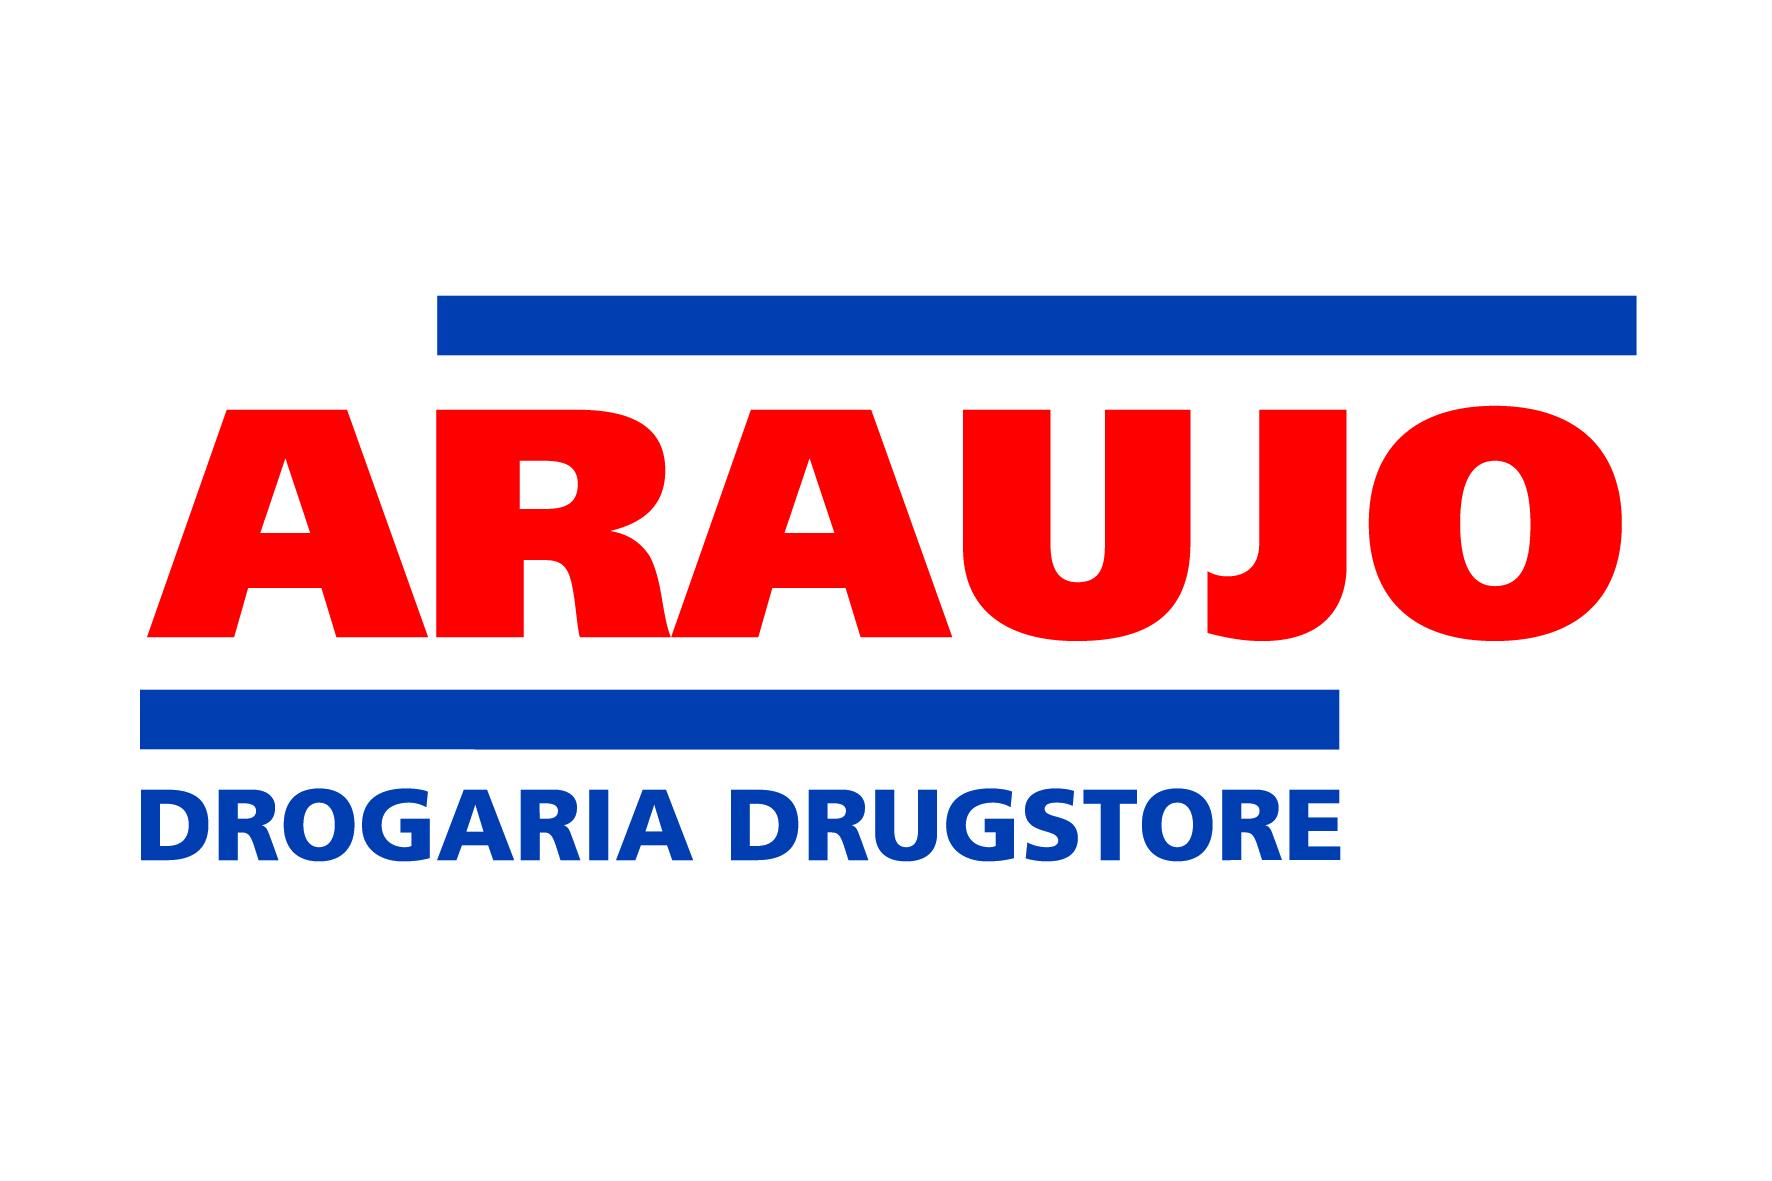 Logotipo DROGARIA ARAUJO